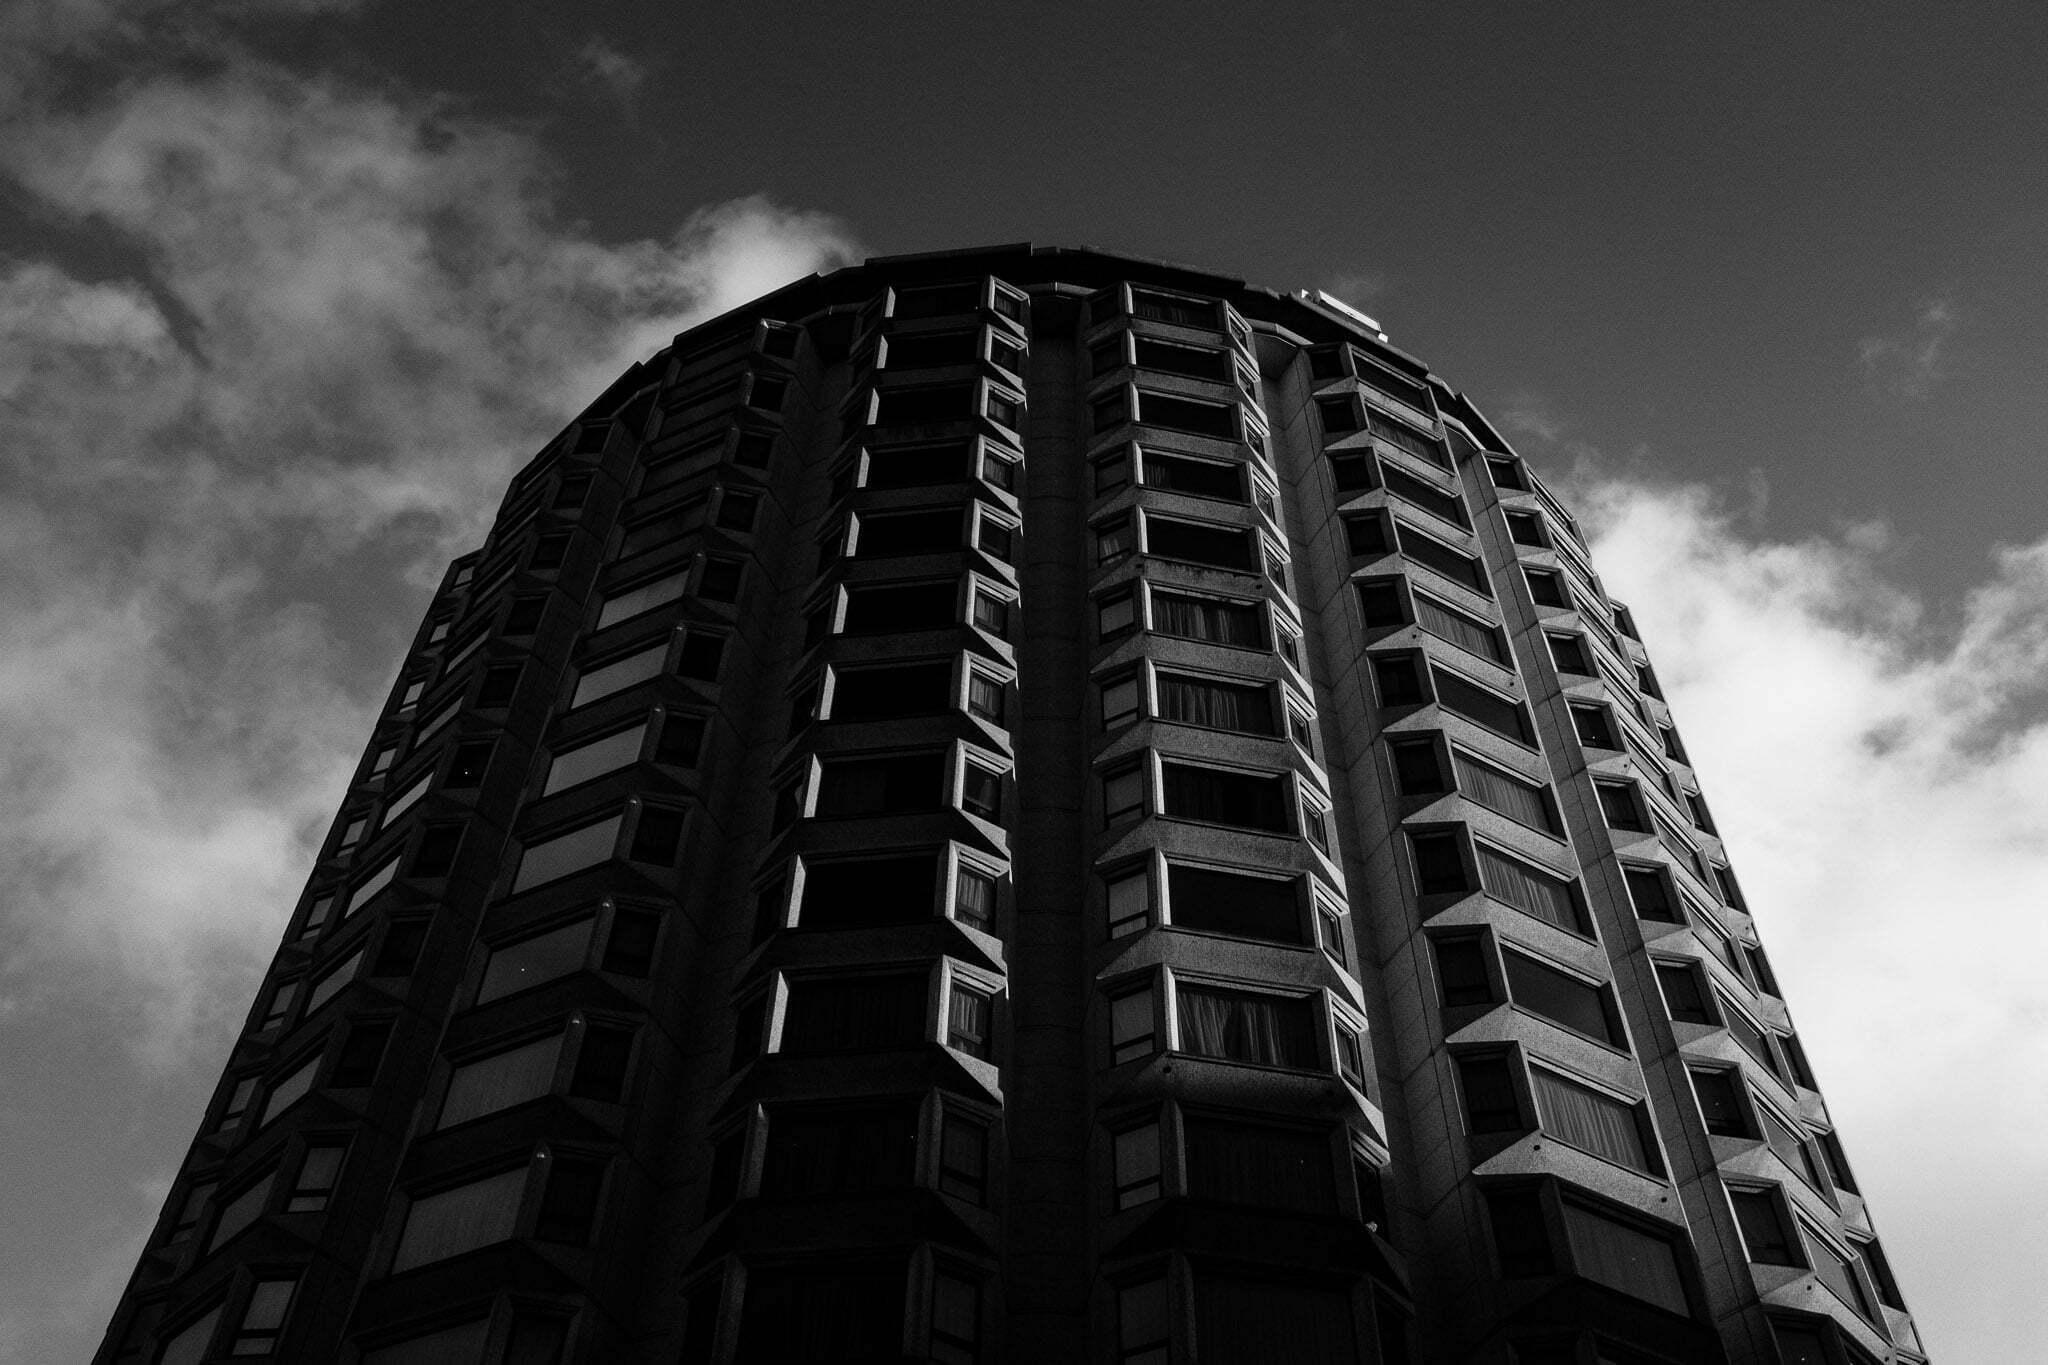 london-street-8032-pete-carr